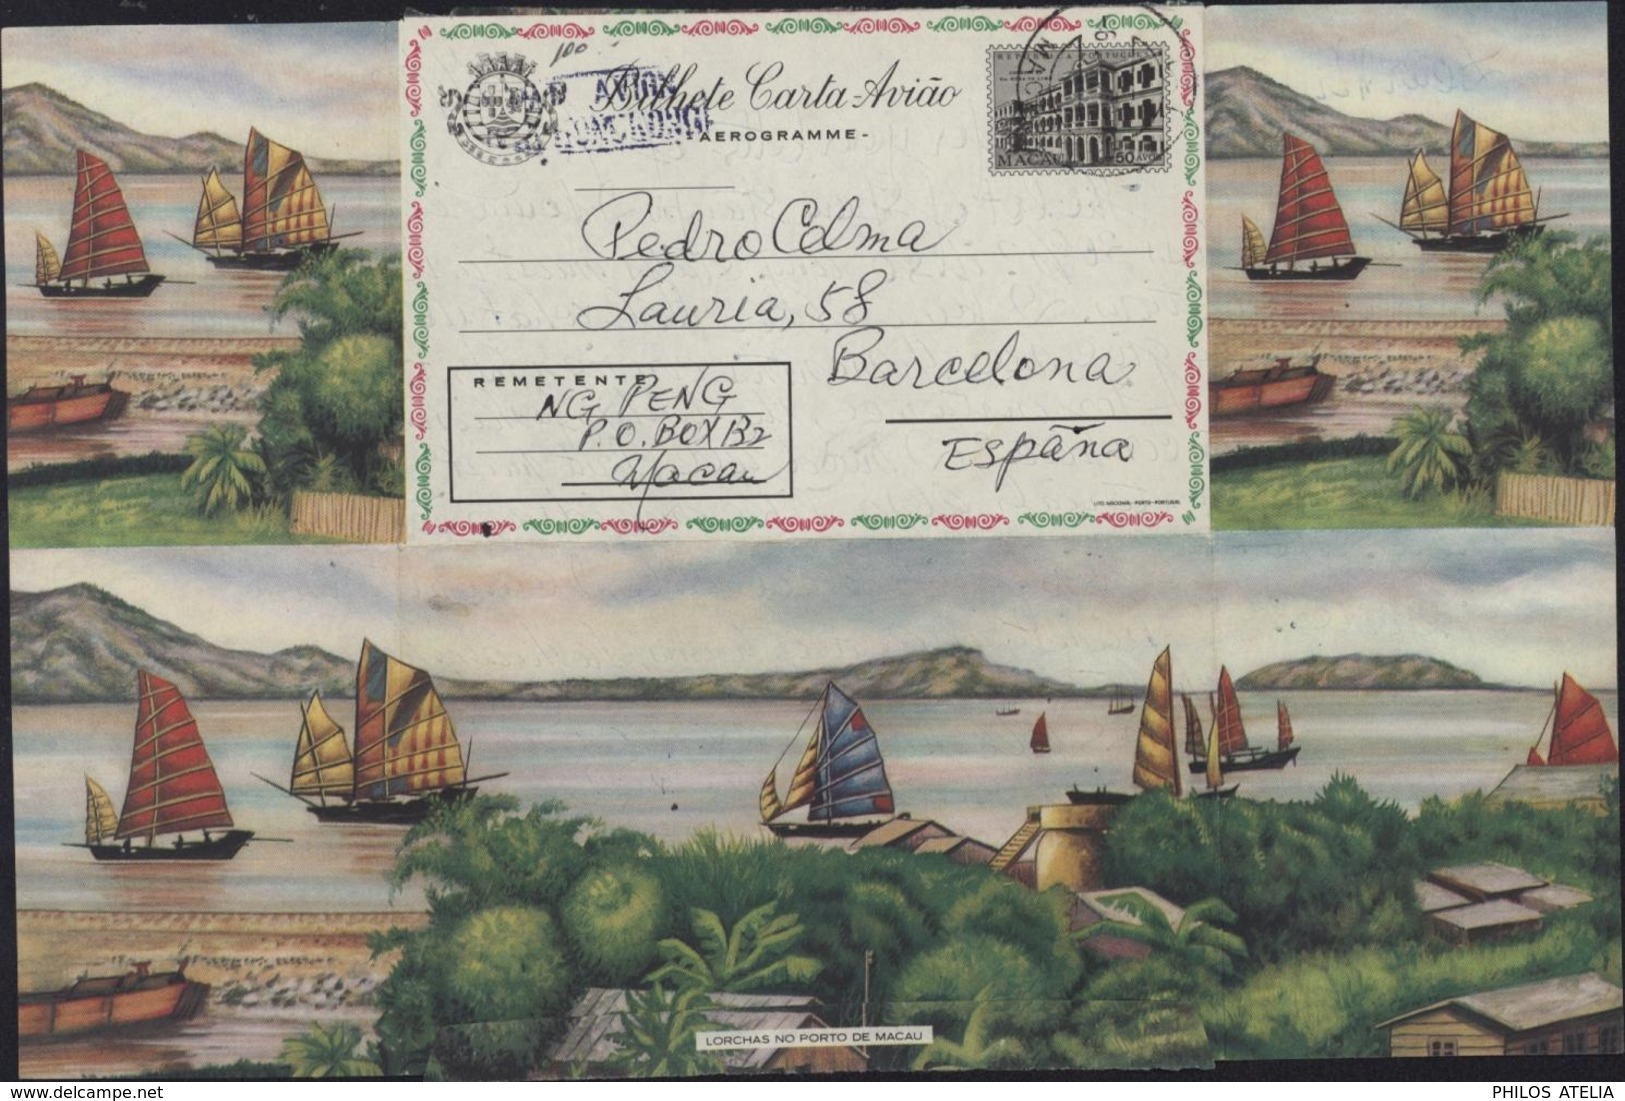 Entier 50 Avos Aérogramme Bilhete Carta Aviao Macau Republica Portuguesa Illustrébaie Jonques Bateaux Lorchas No Porto - Postal Stationery